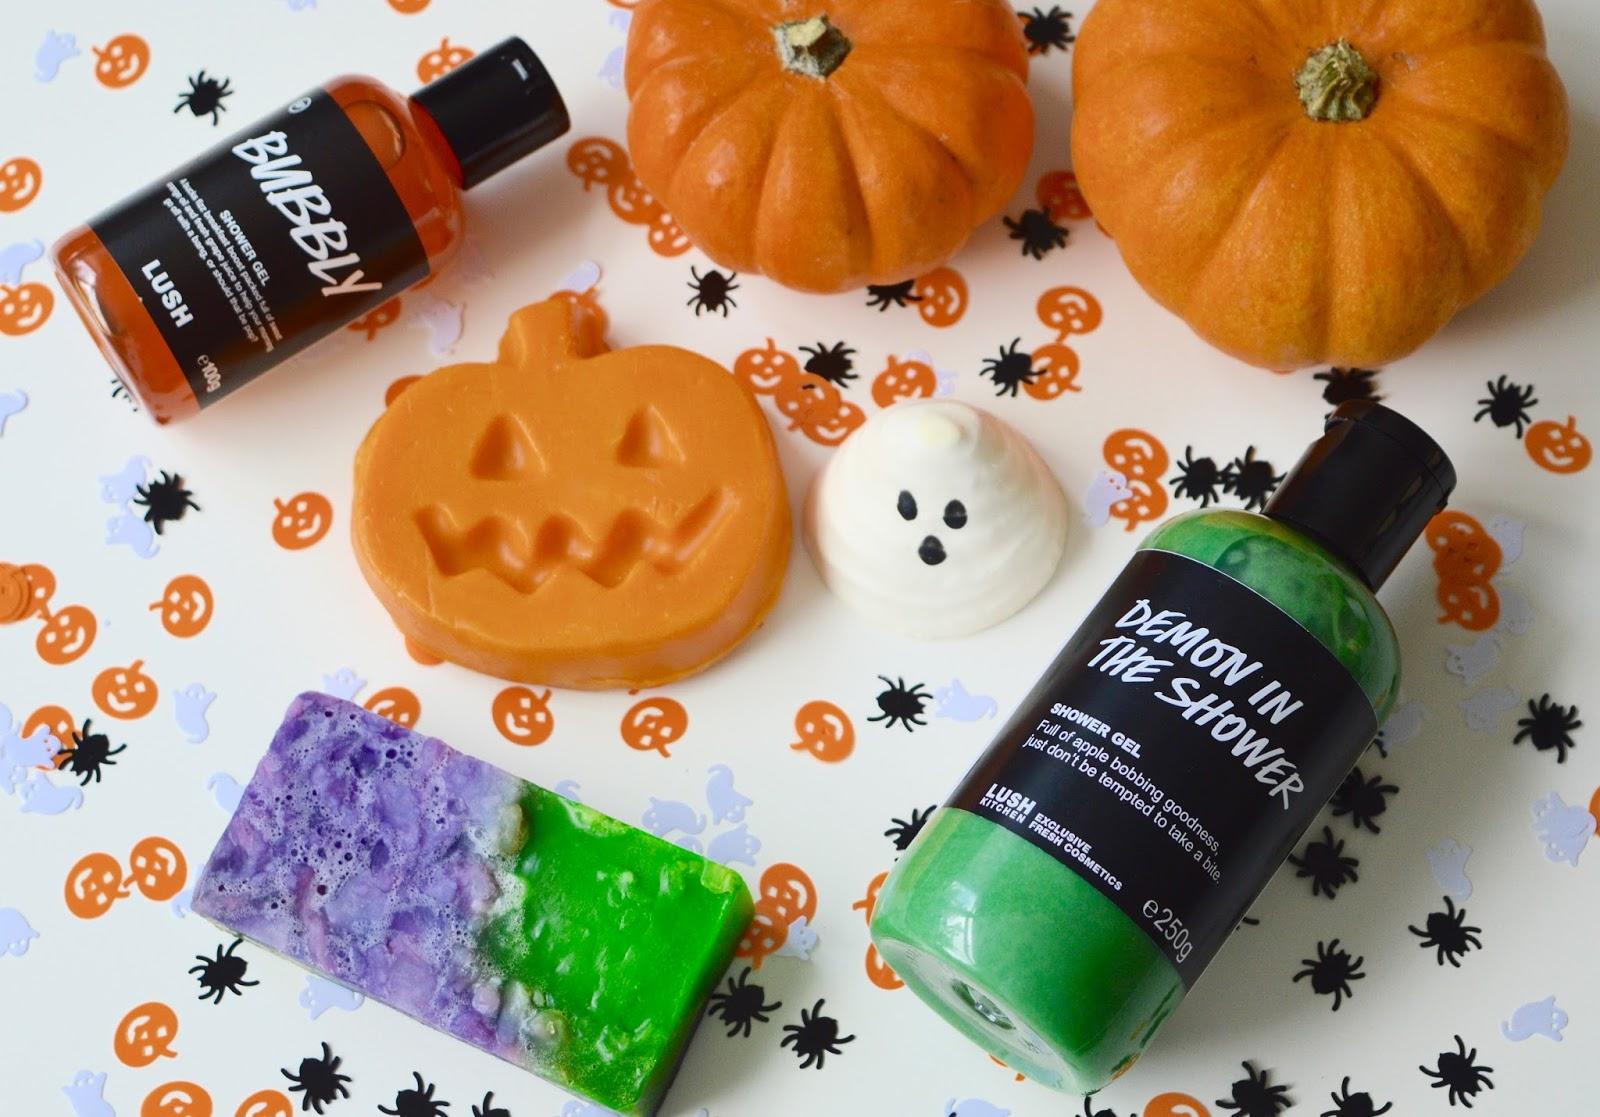 Beauty Review Lush 2016 Halloween Haul Popcorn And Glitter